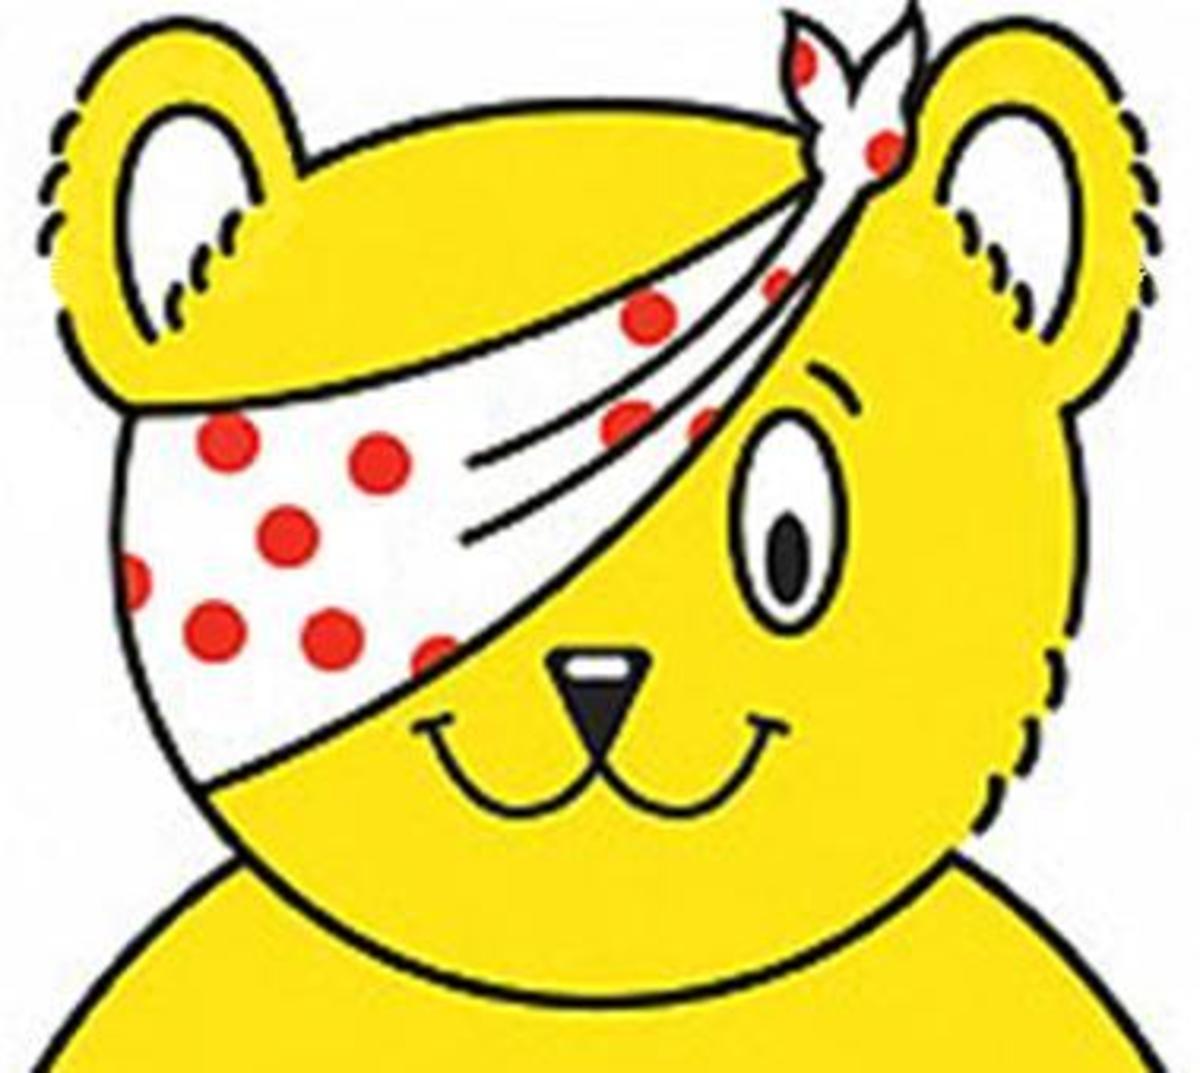 Blush+children+in+need+bear